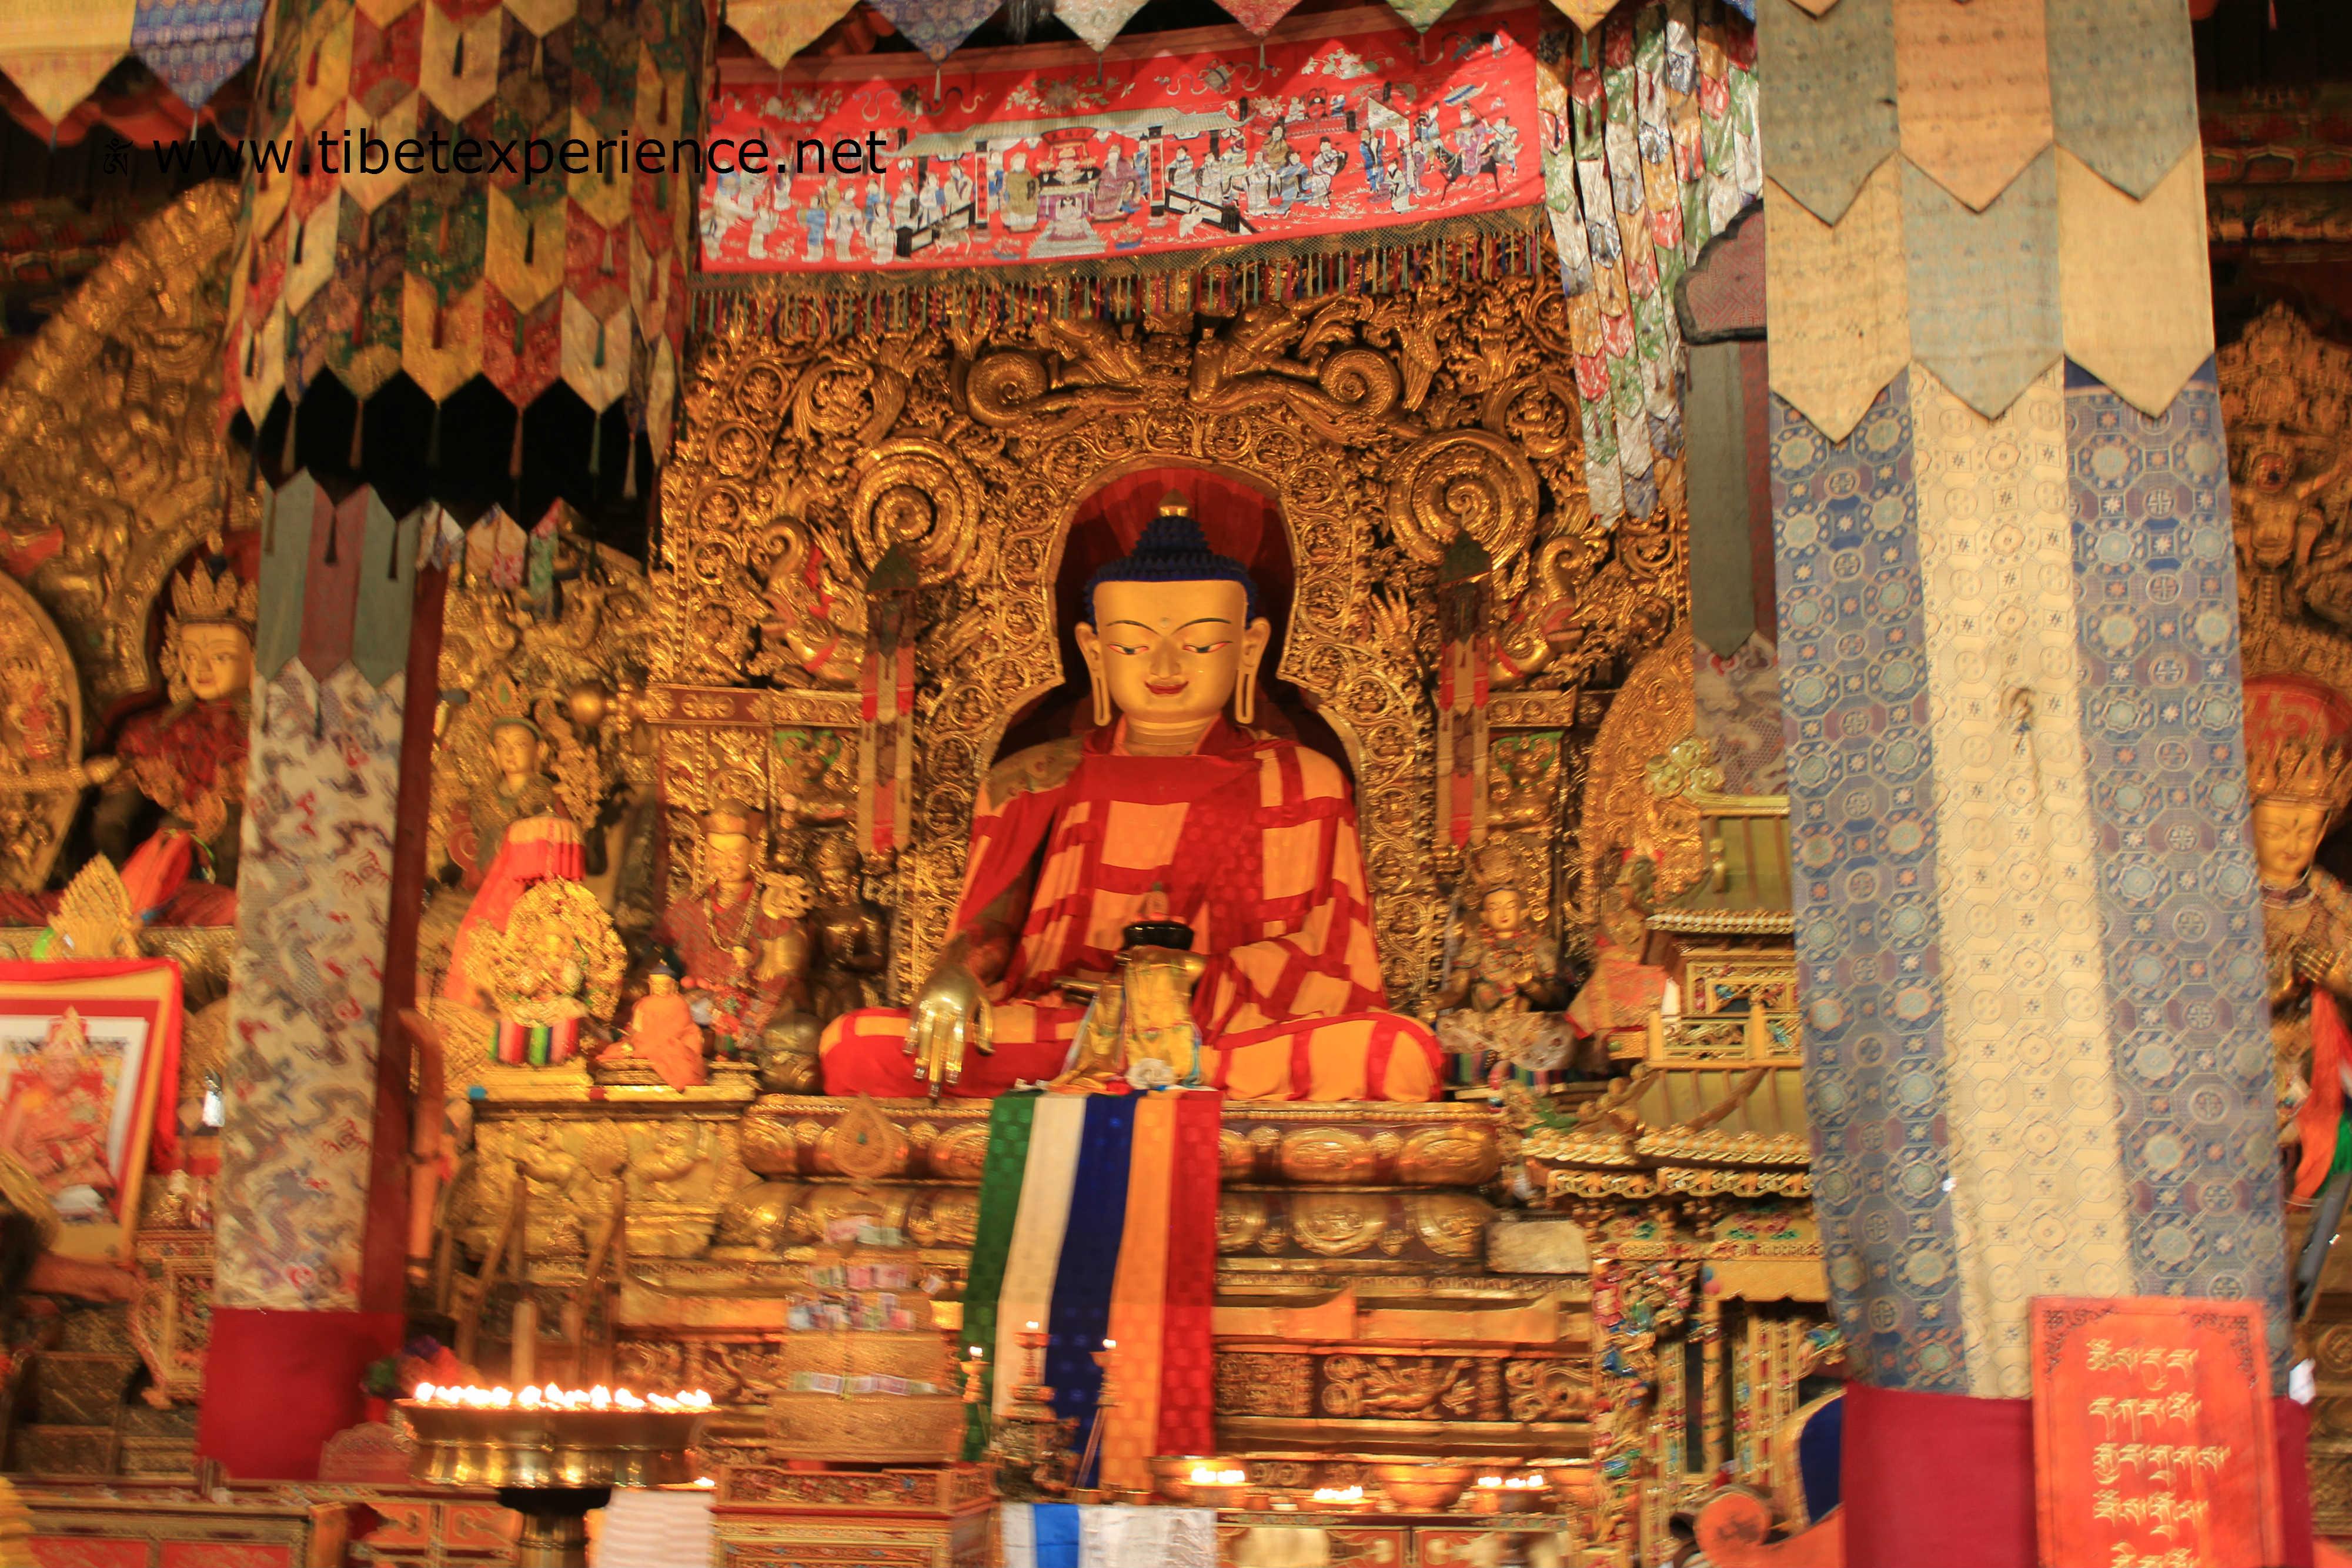 Тибет. Монастырь Сакья. Зал Собраний. Будда Шакьямуни.jpg